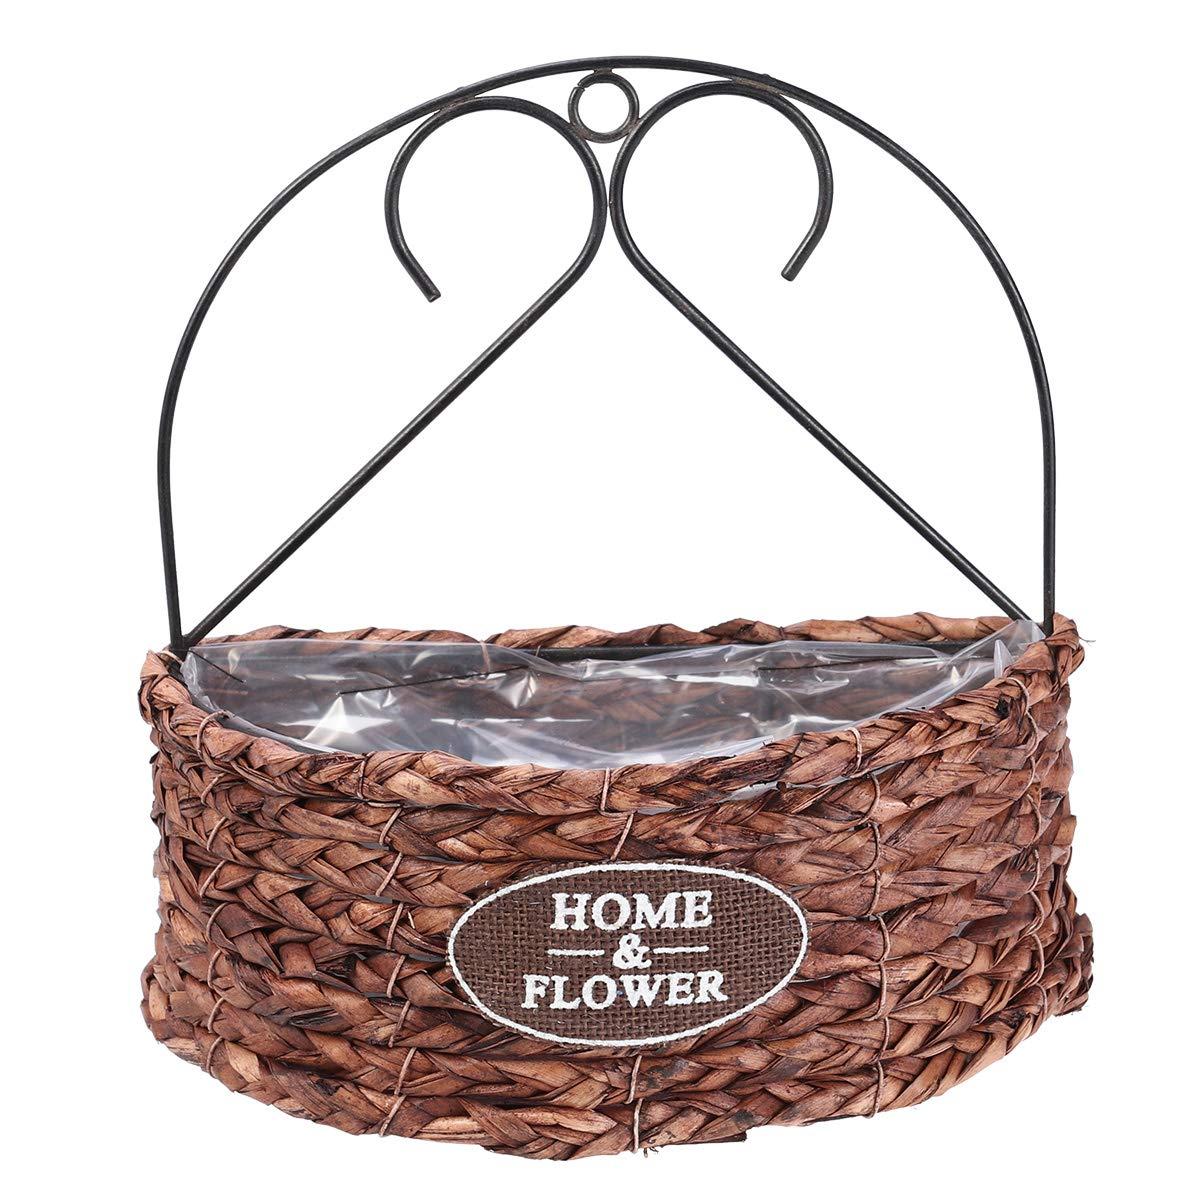 BESTOMZ Flower Basket, Wall Hanging Handmade Floral Basket Indoor Outdoor Decor Semicircle Planter Basket Flower Pot Single-Deck